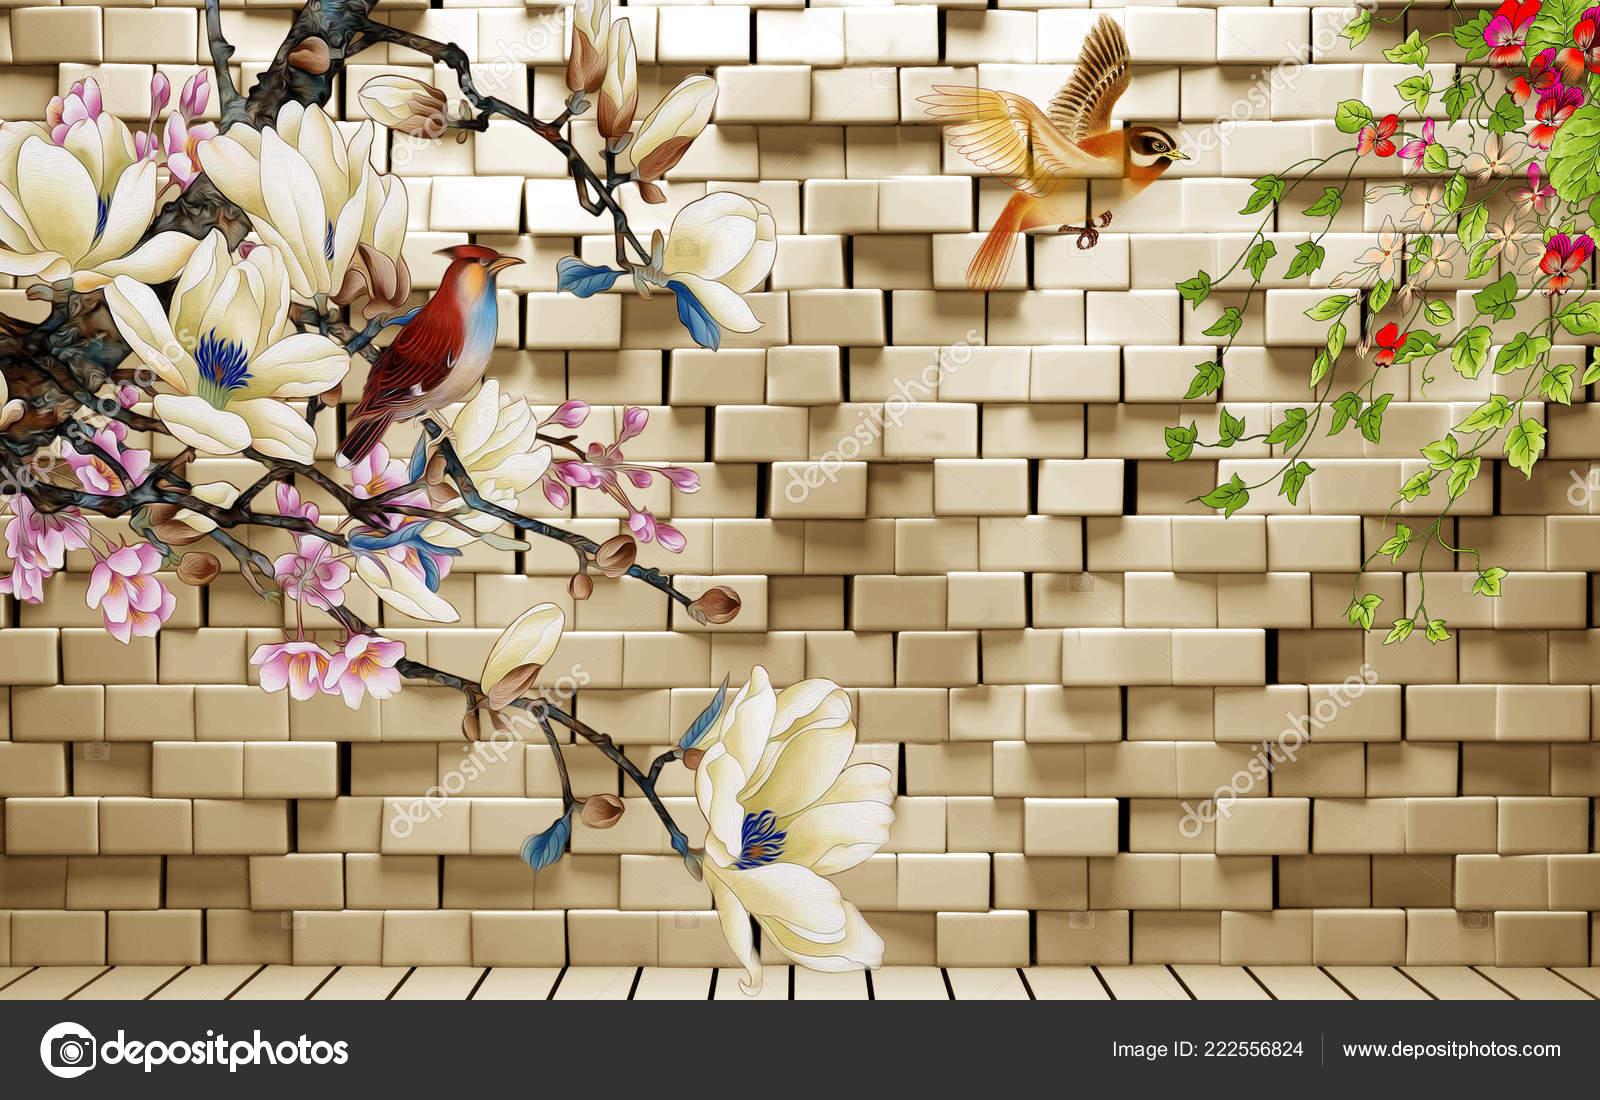 Illustration Background White Brick Wall Warm Illumination Birds Fabulous Flowers Stock Photo Image By Timkats 222556824